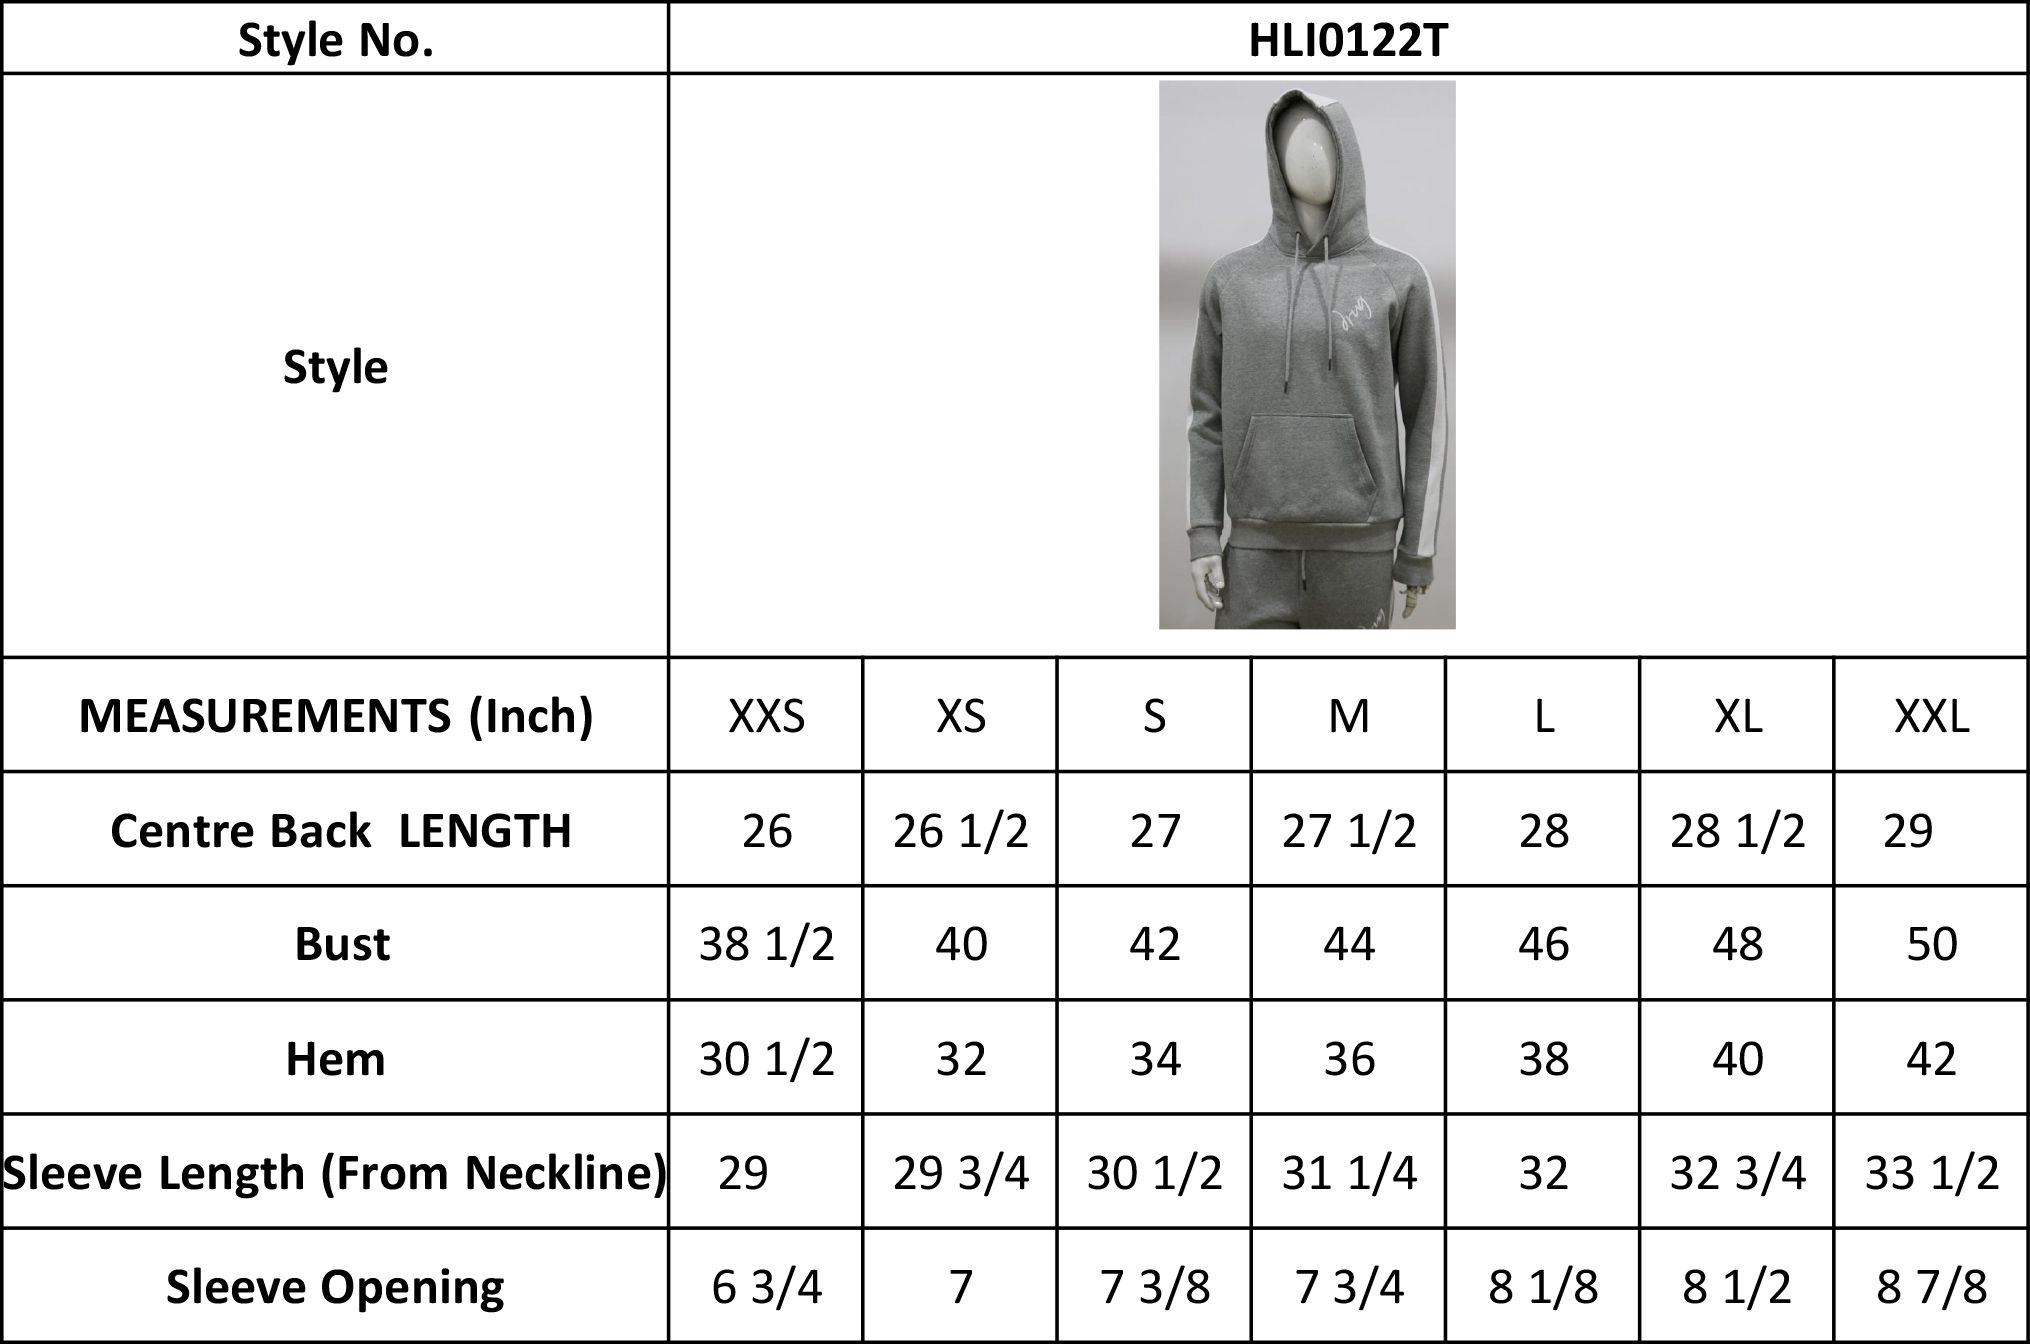 HLI0122T&0122B size chart-1.jpg